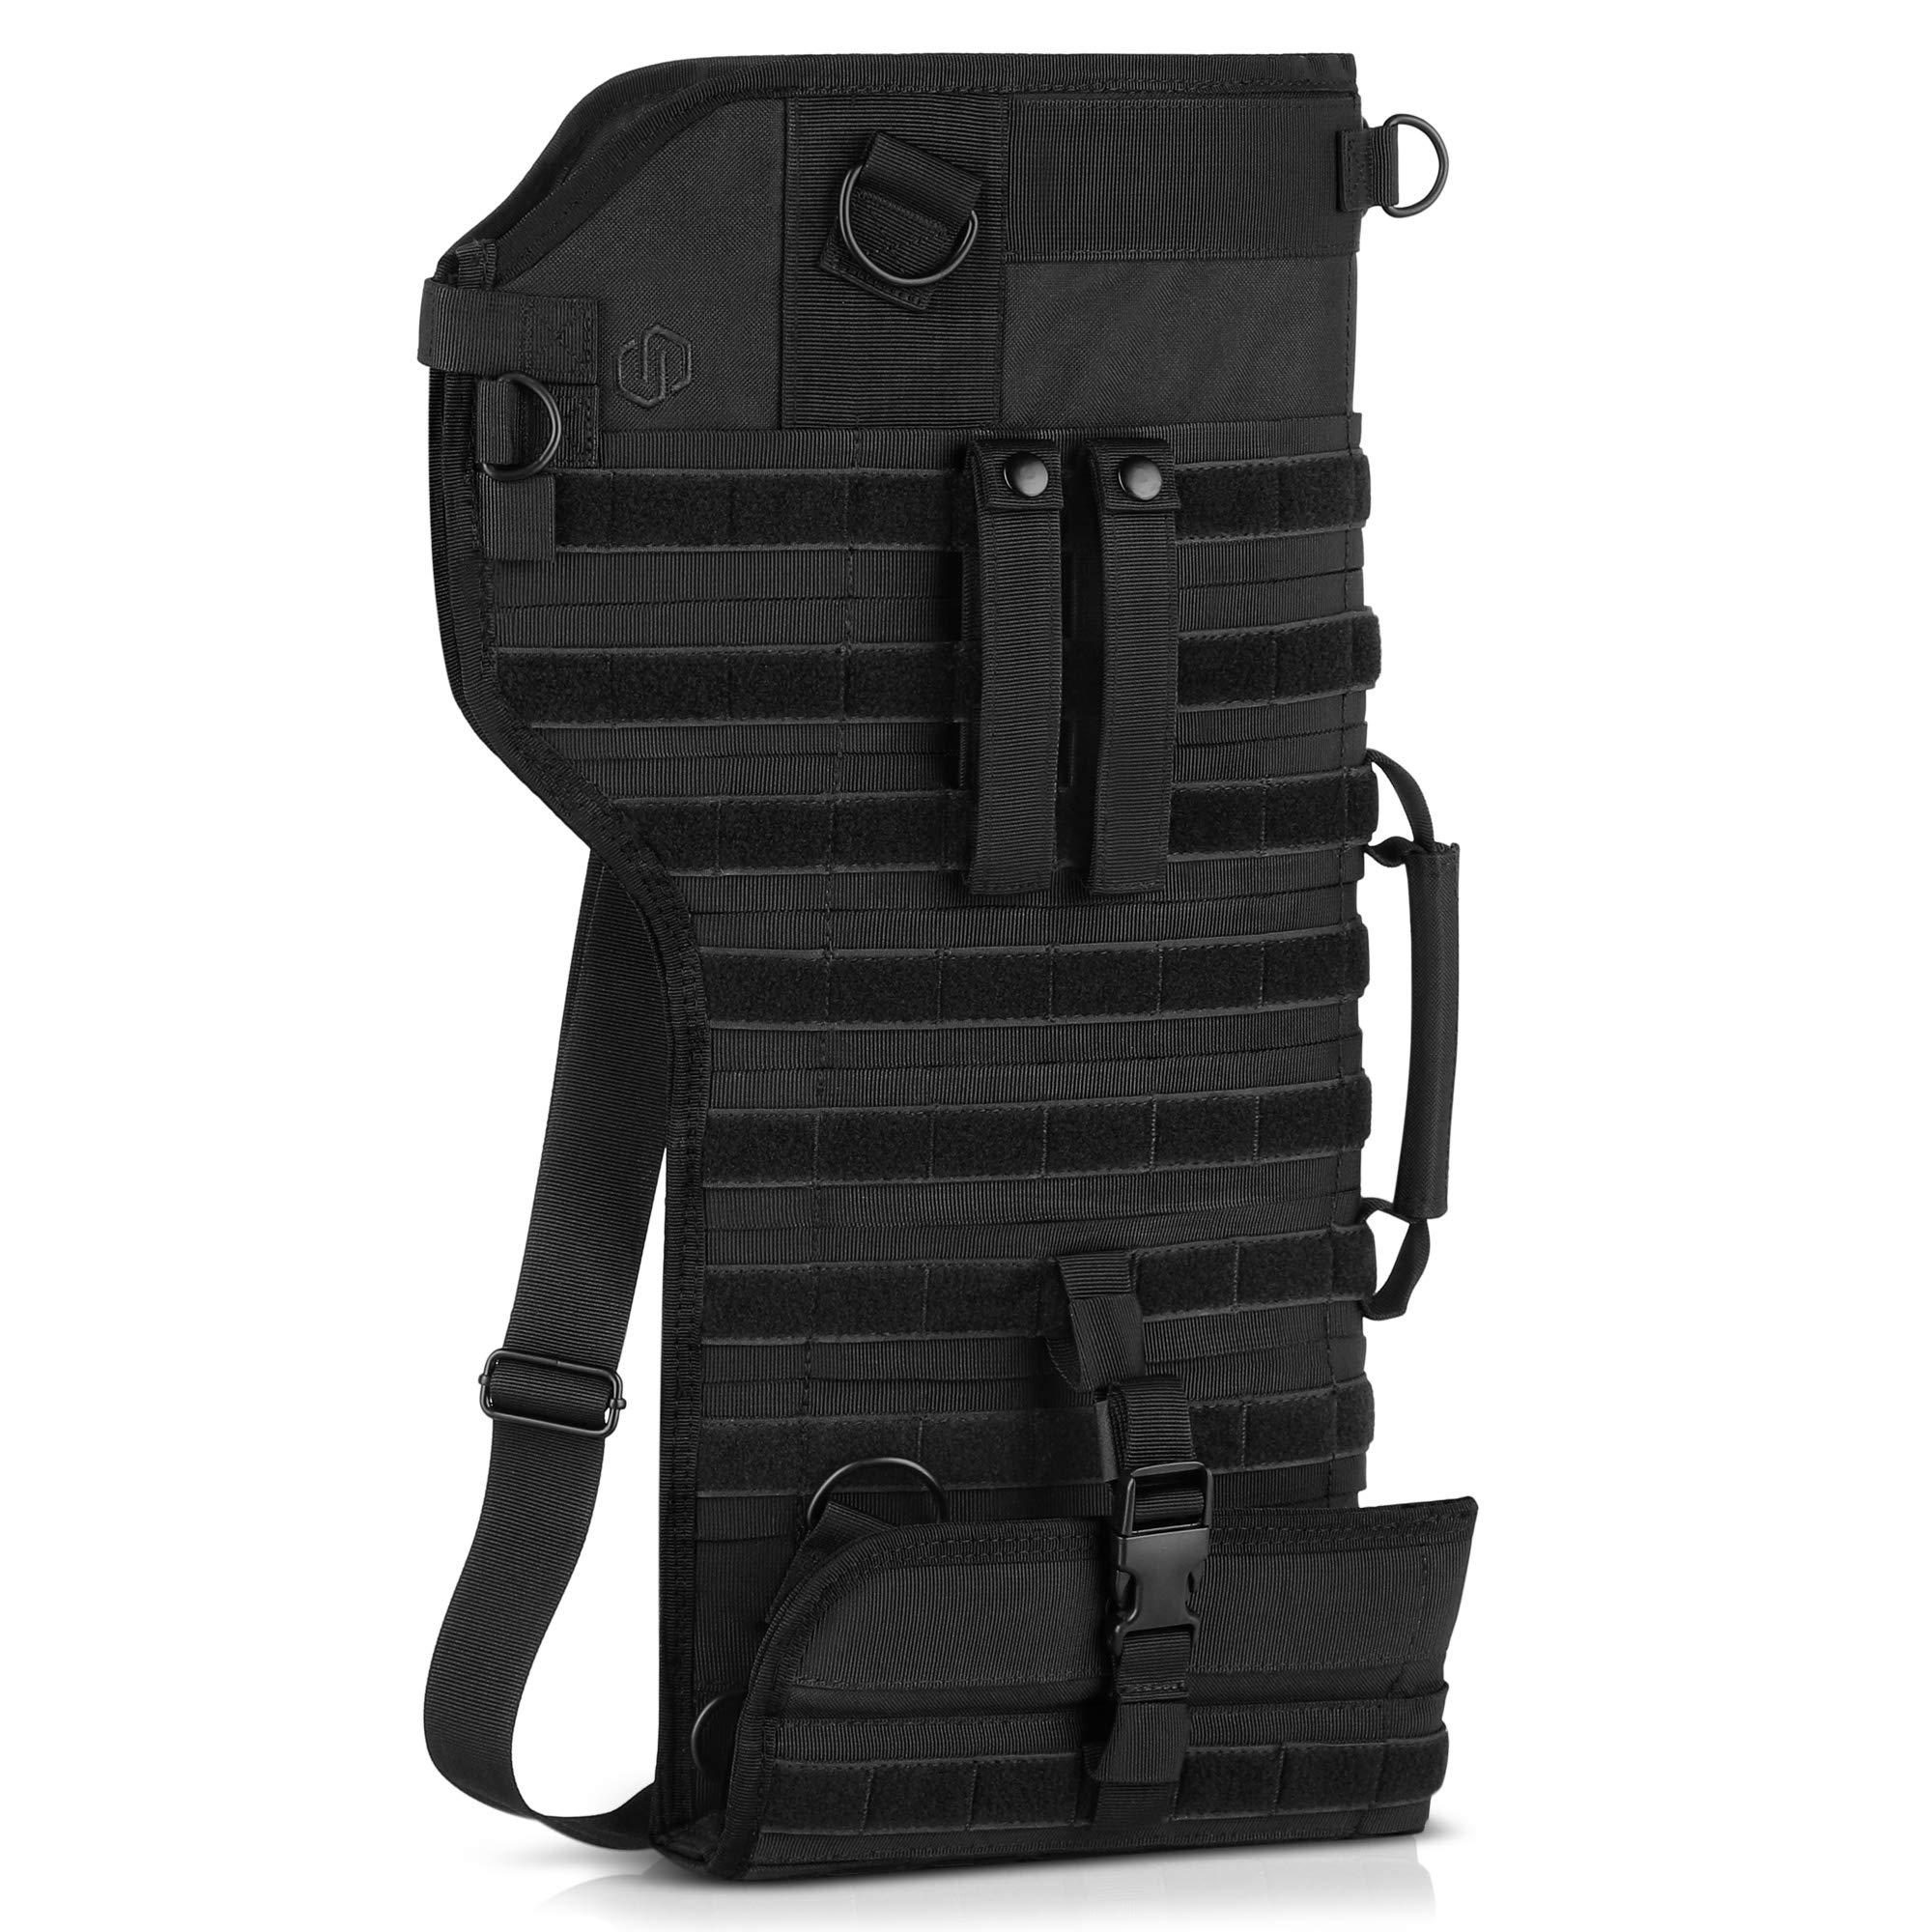 Savior Equipment Premium Tactical Shotgun Rifle Scabbard MOLLE Gun Case - Adjustable Carry Shoulder Strap, Firearm Protection Sling Bag by Savior Equipment